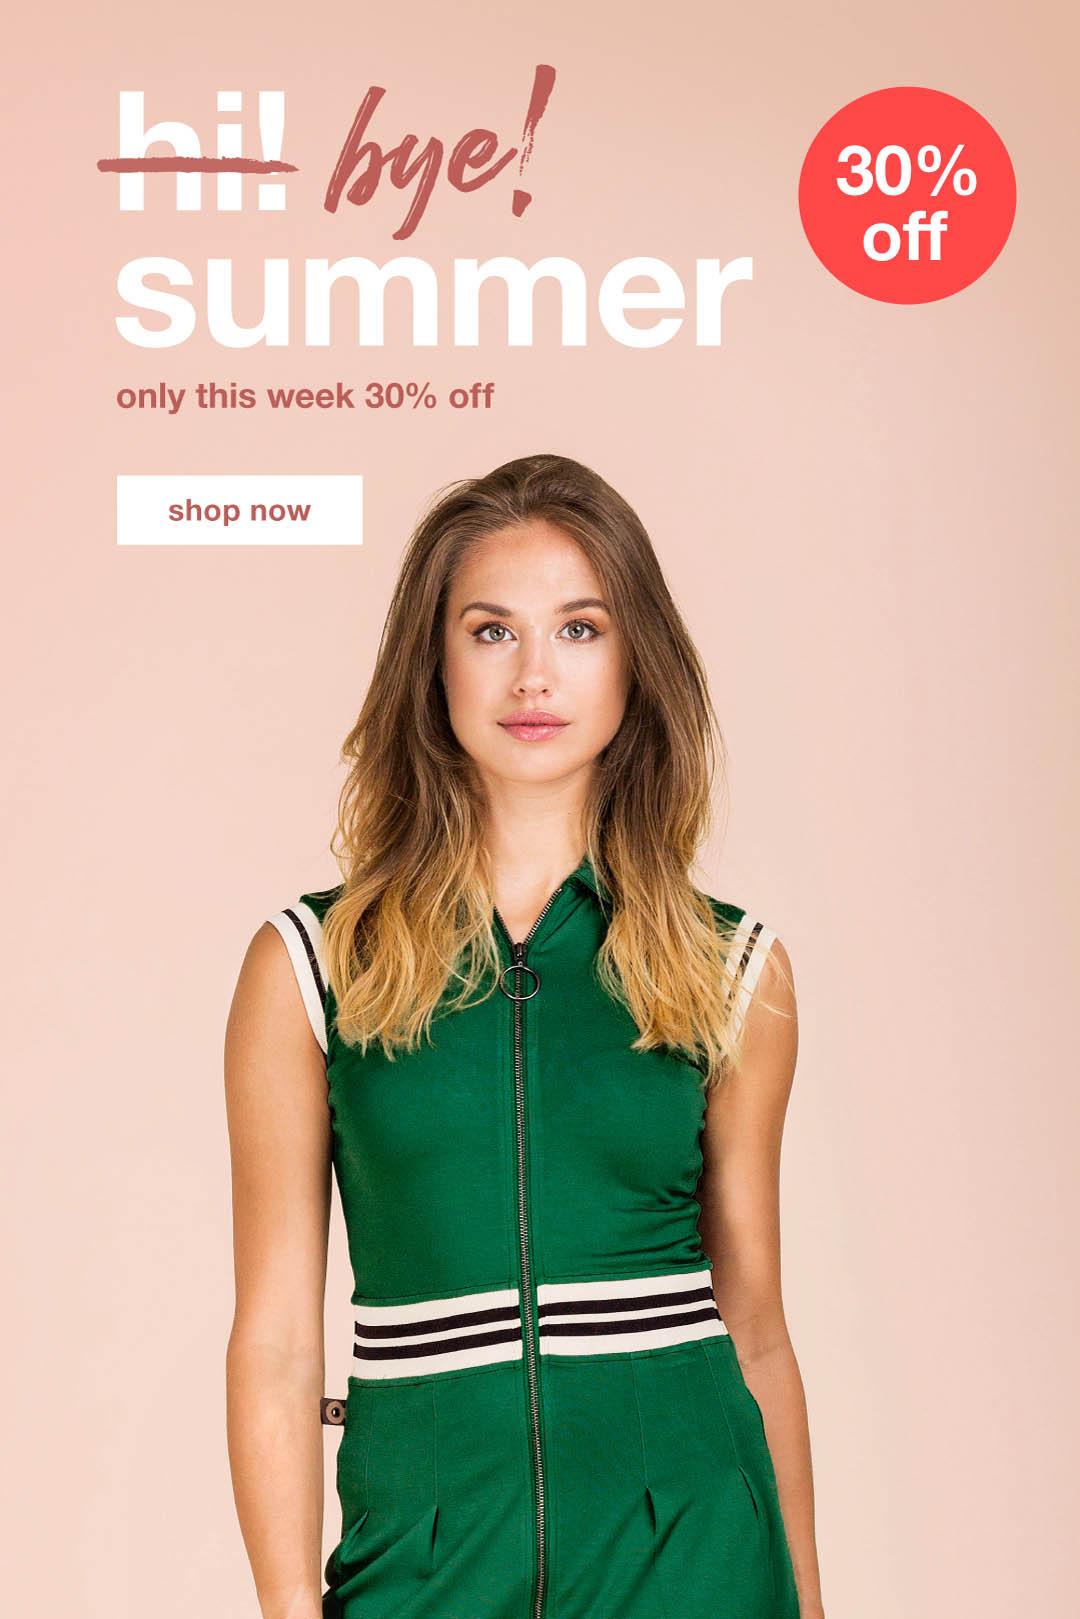 30% off - bye! summer